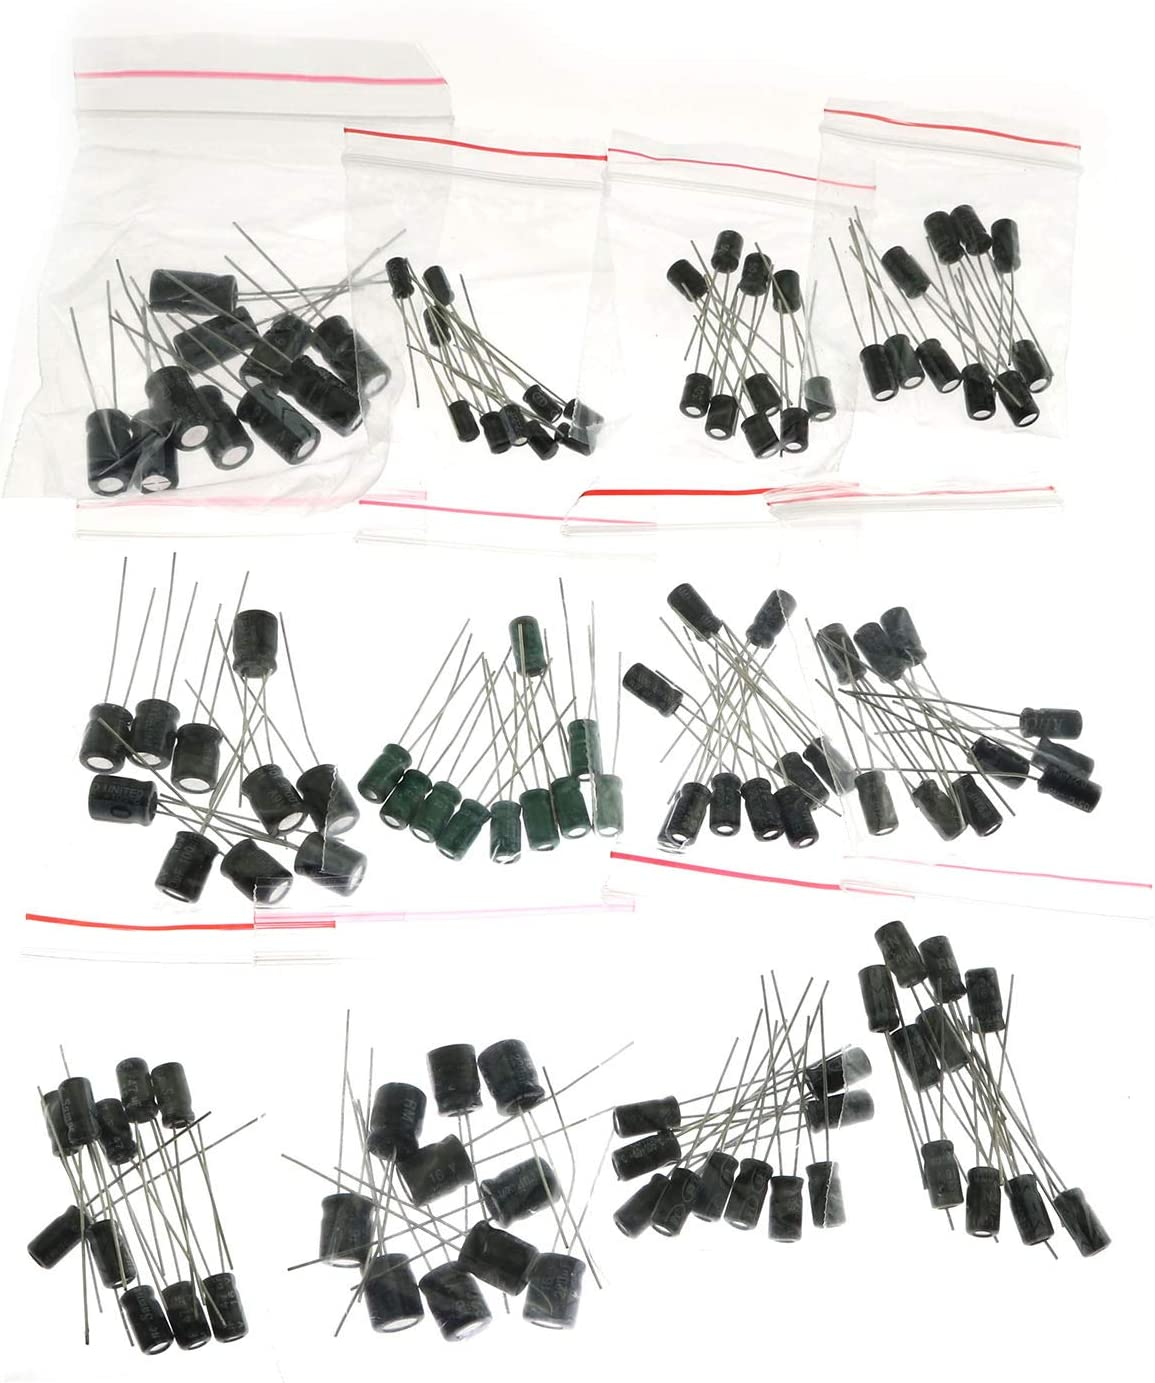 RLECS 120-Pack 0.22UF-470UF Aluminum Electrolytic Capacitor Assorted Assortment Kit Set Commonly Used Electronic Component 12 Values